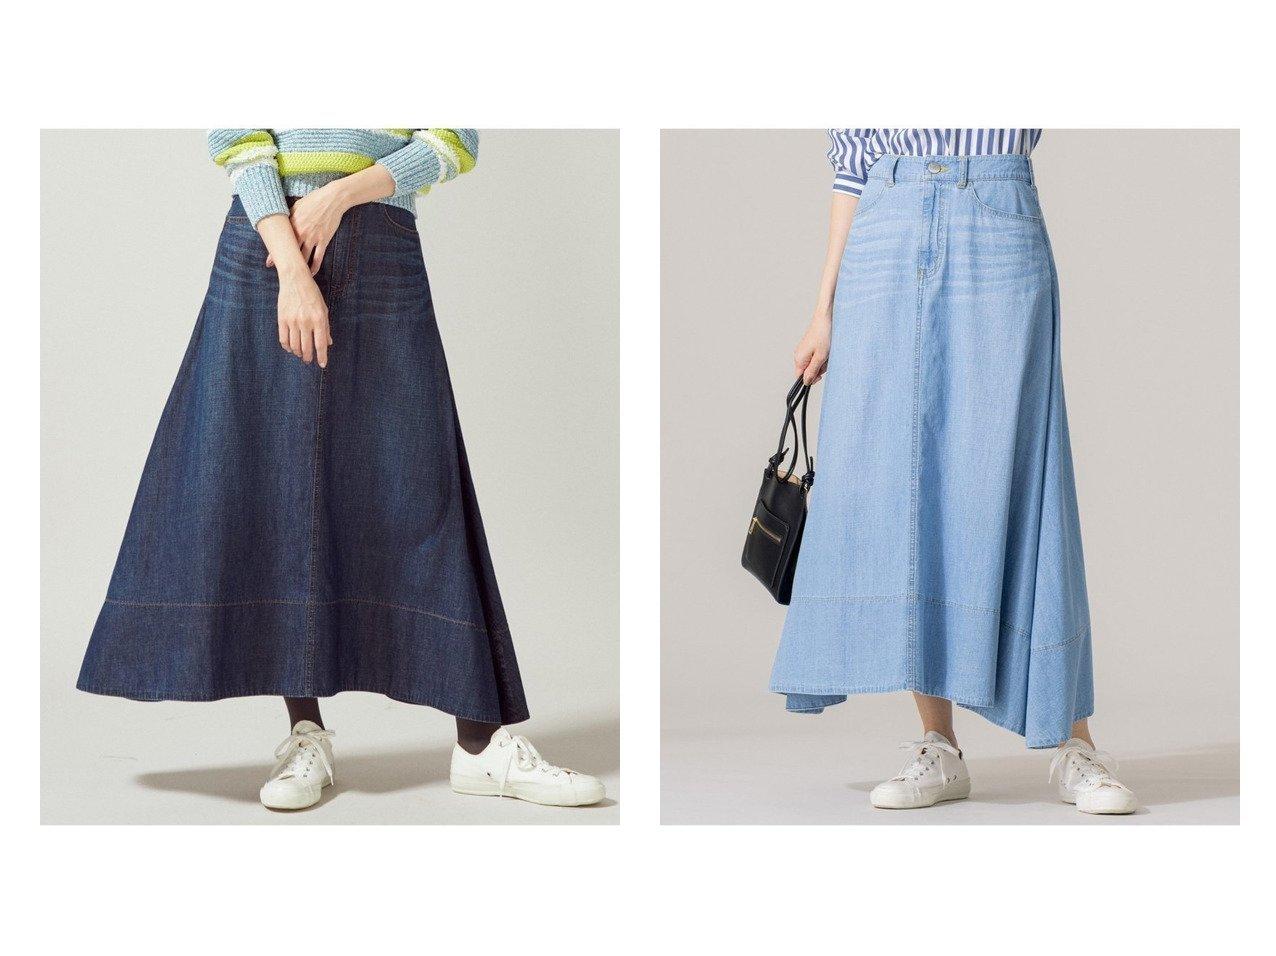 【KUMIKYOKU/組曲】の【洗える】ライトオンス デニム マキシ デニムスカート 【スカート】おすすめ!人気、トレンド・レディースファッションの通販 おすすめで人気の流行・トレンド、ファッションの通販商品 メンズファッション・キッズファッション・インテリア・家具・レディースファッション・服の通販 founy(ファニー) https://founy.com/ ファッション Fashion レディースファッション WOMEN スカート Skirt デニムスカート Denim Skirts 春 Spring 洗える コンパクト タイツ デニム ドレープ フレア マキシ ロング 2021年 2021 S/S・春夏 SS・Spring/Summer 2021春夏・S/S SS/Spring/Summer/2021 おすすめ Recommend |ID:crp329100000028456